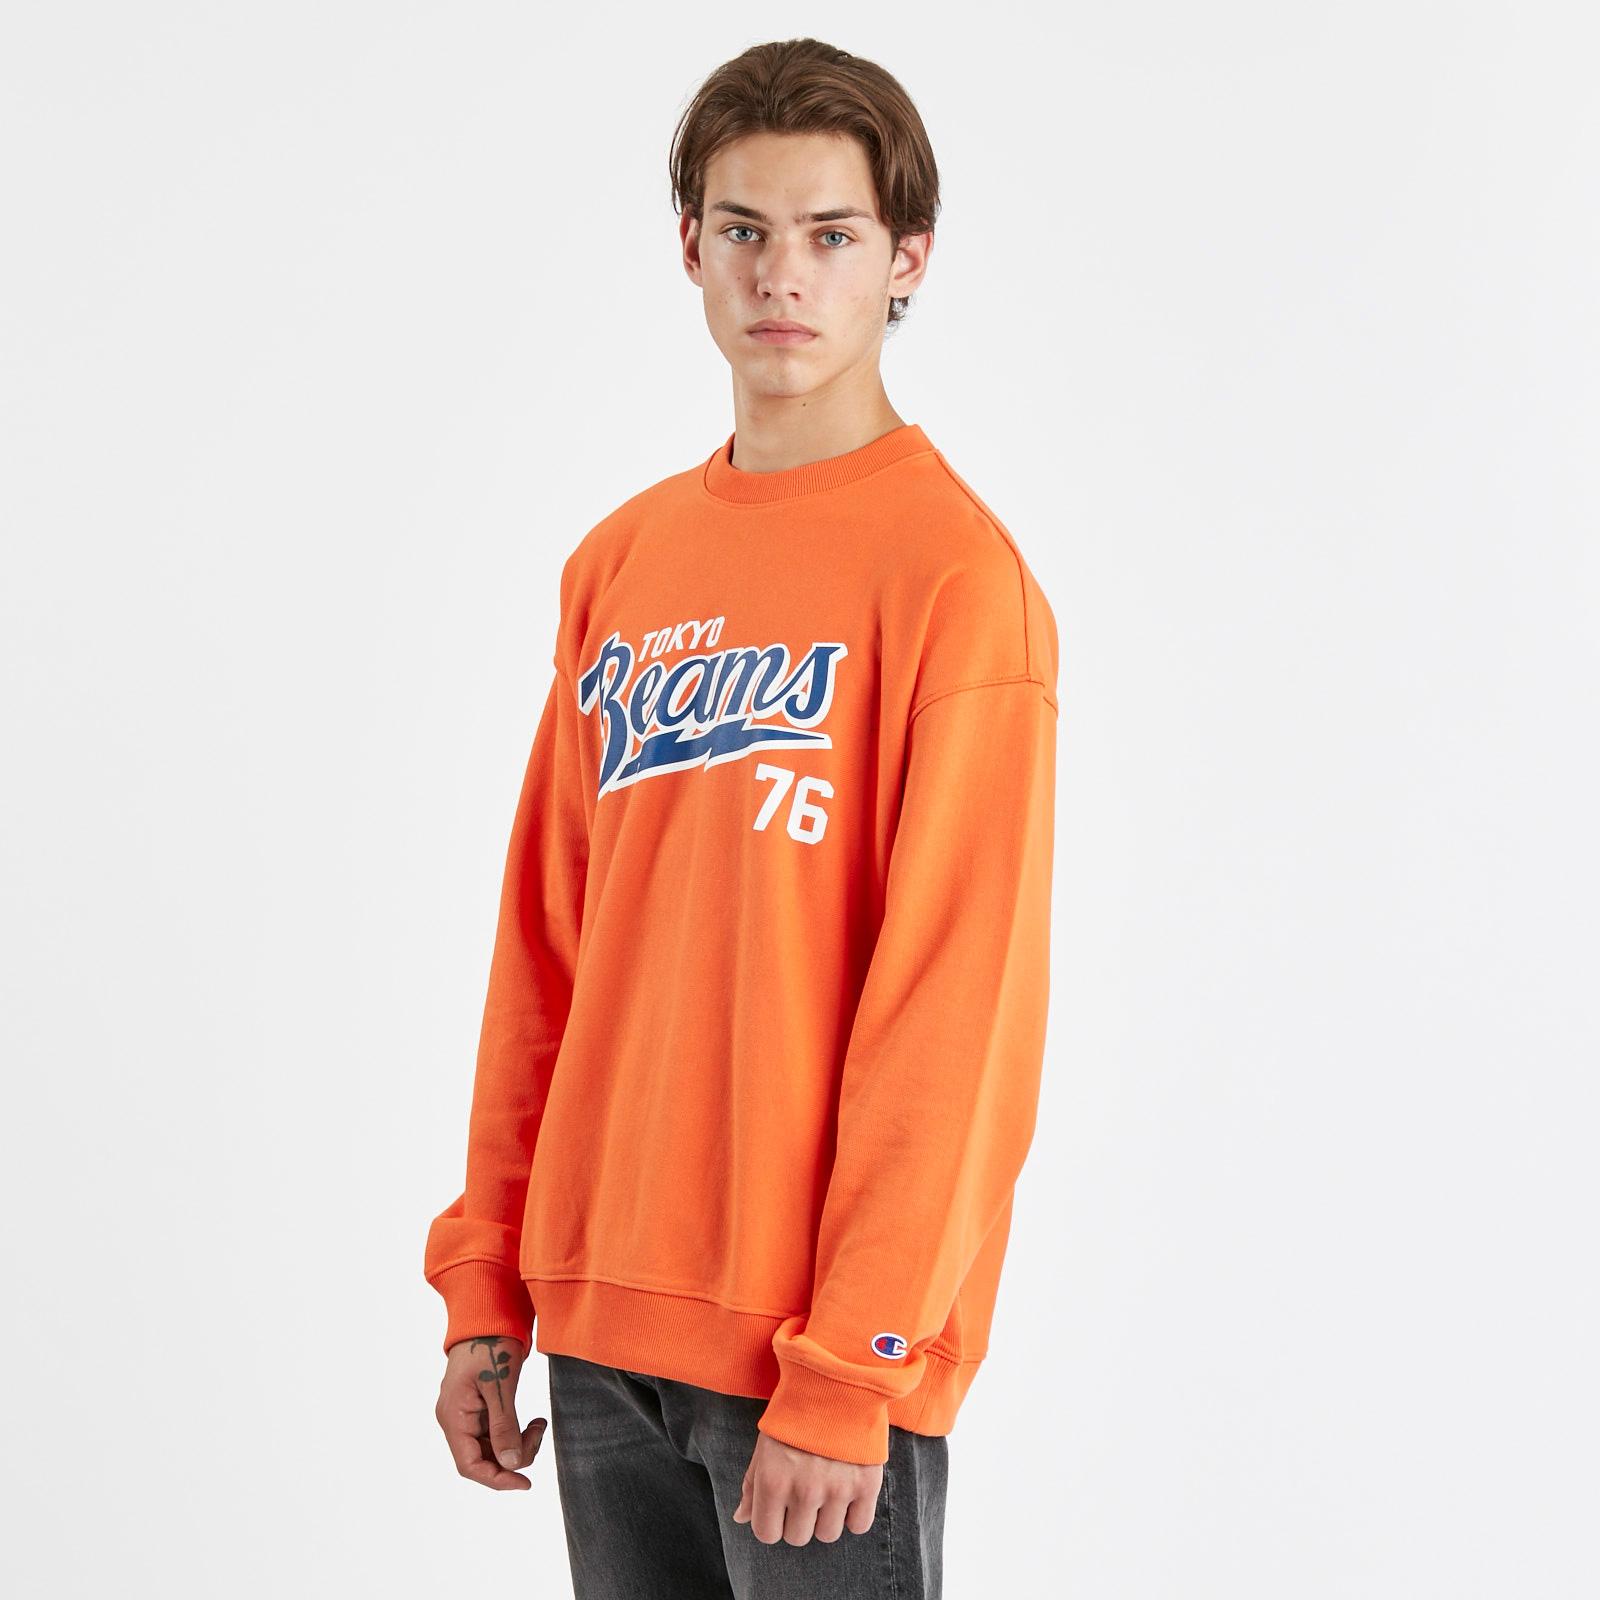 18416051 Champion Reverse Weave Terry Crew x BEAMS - 212627-os021 - Sneakersnstuff I  Sneakers & Streetwear online seit 1999